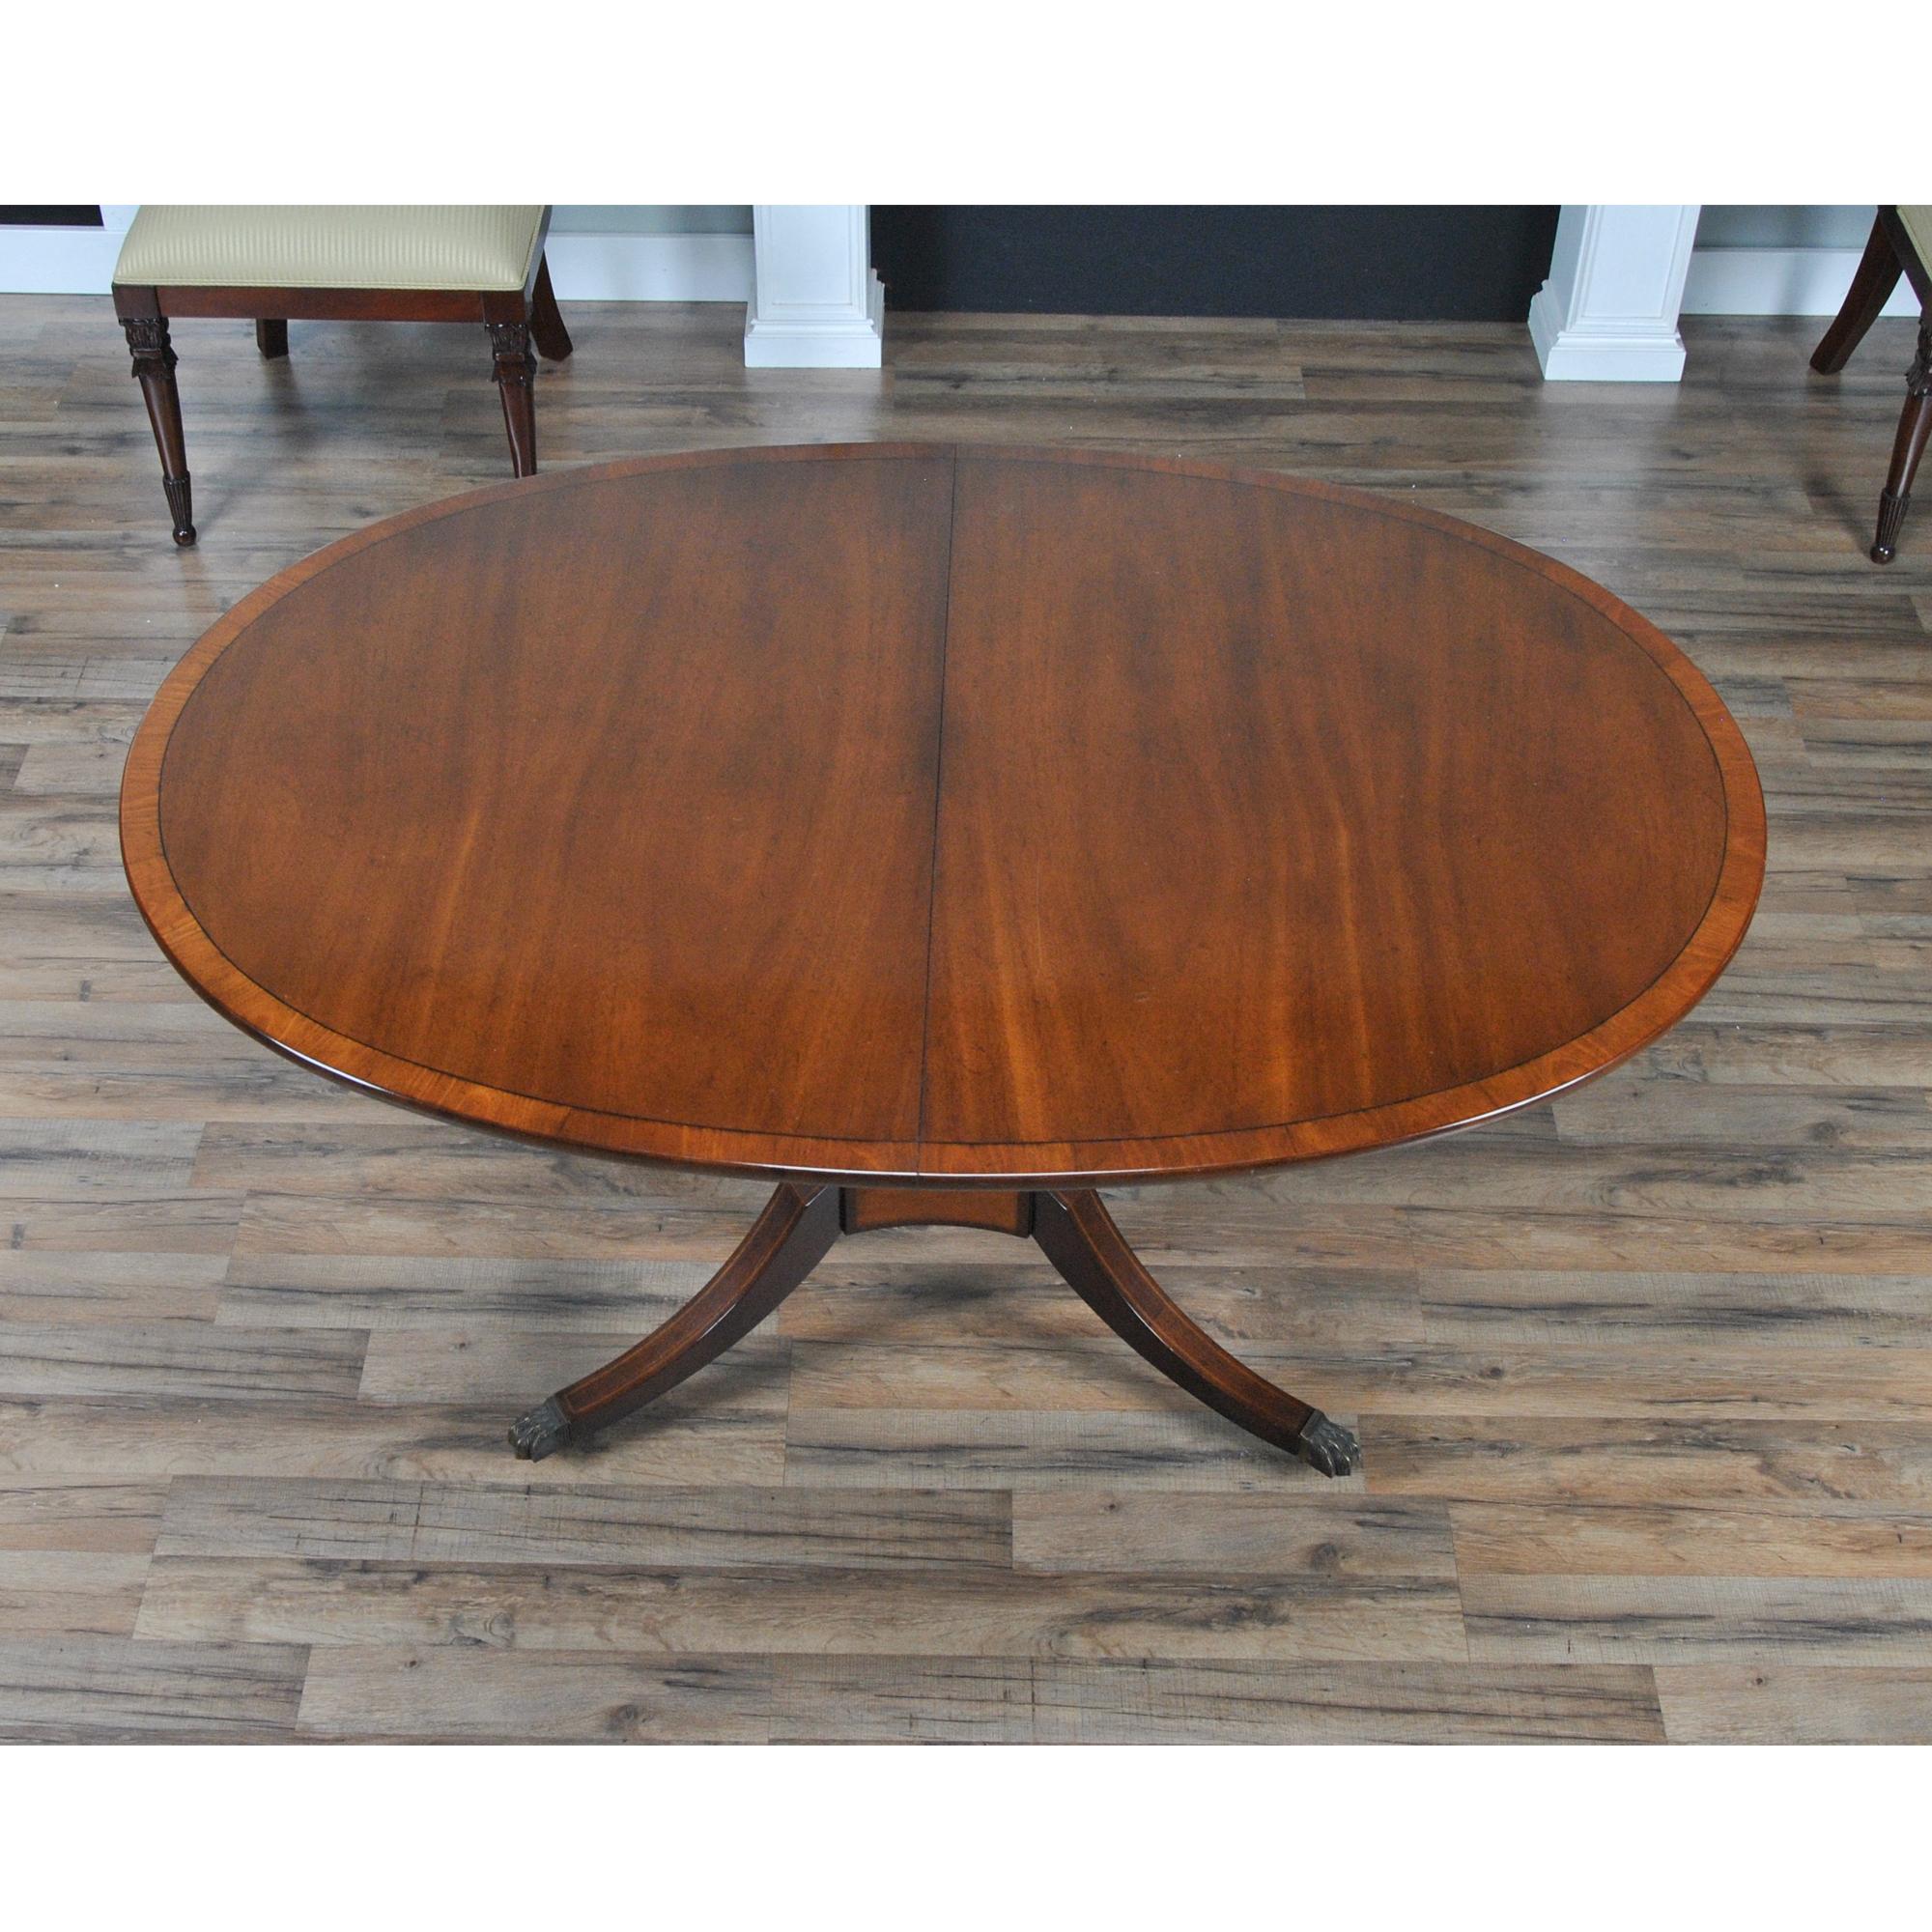 Beacon Hill Dining Table Niagara Furniture Mahogany Table